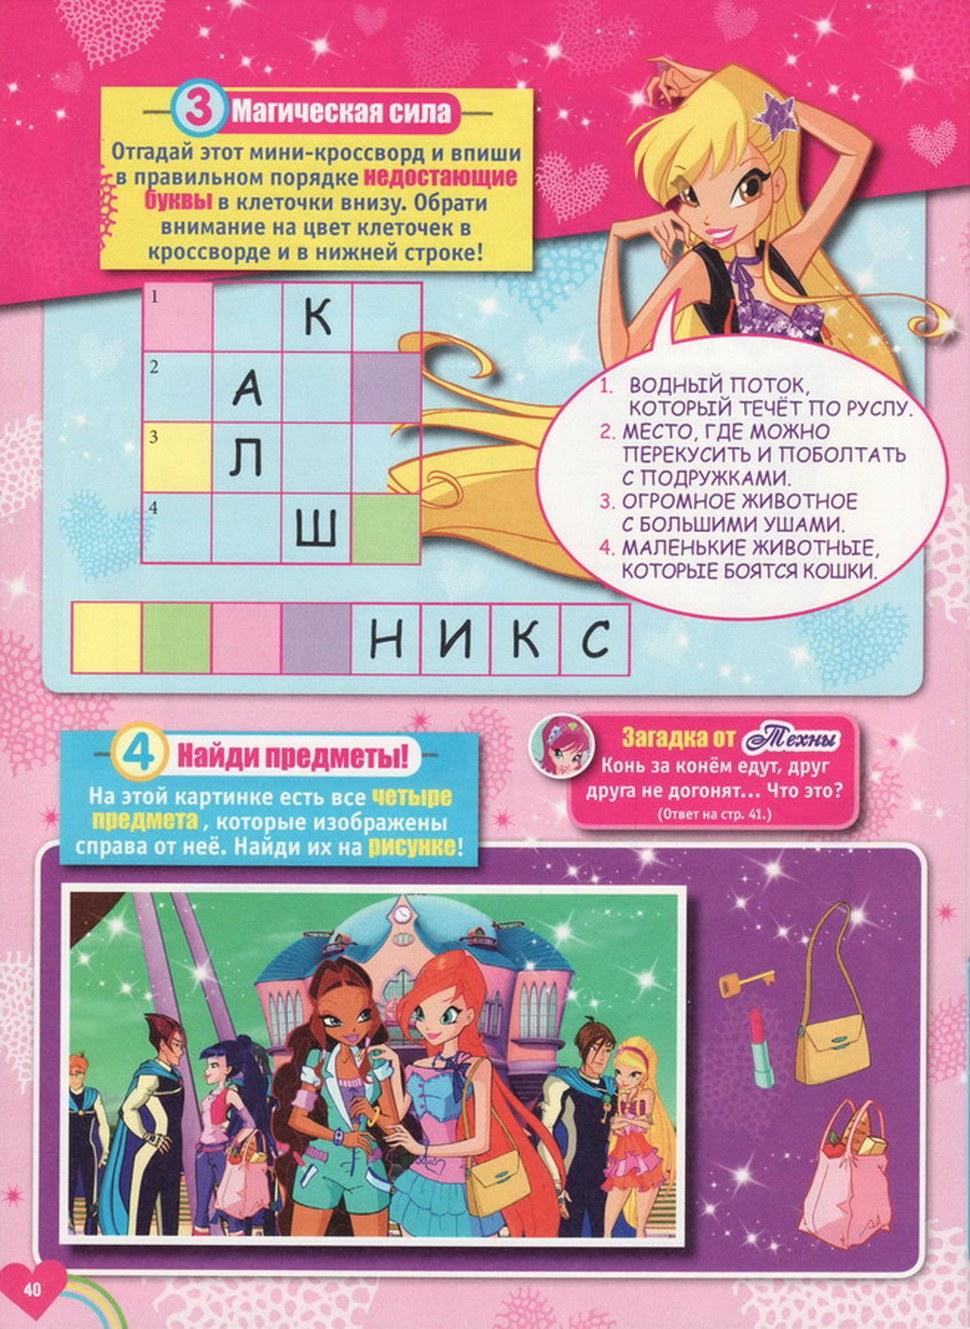 Комикс Винкс Winx - Тёмные русалки (Журнал Винкс №10 2013)